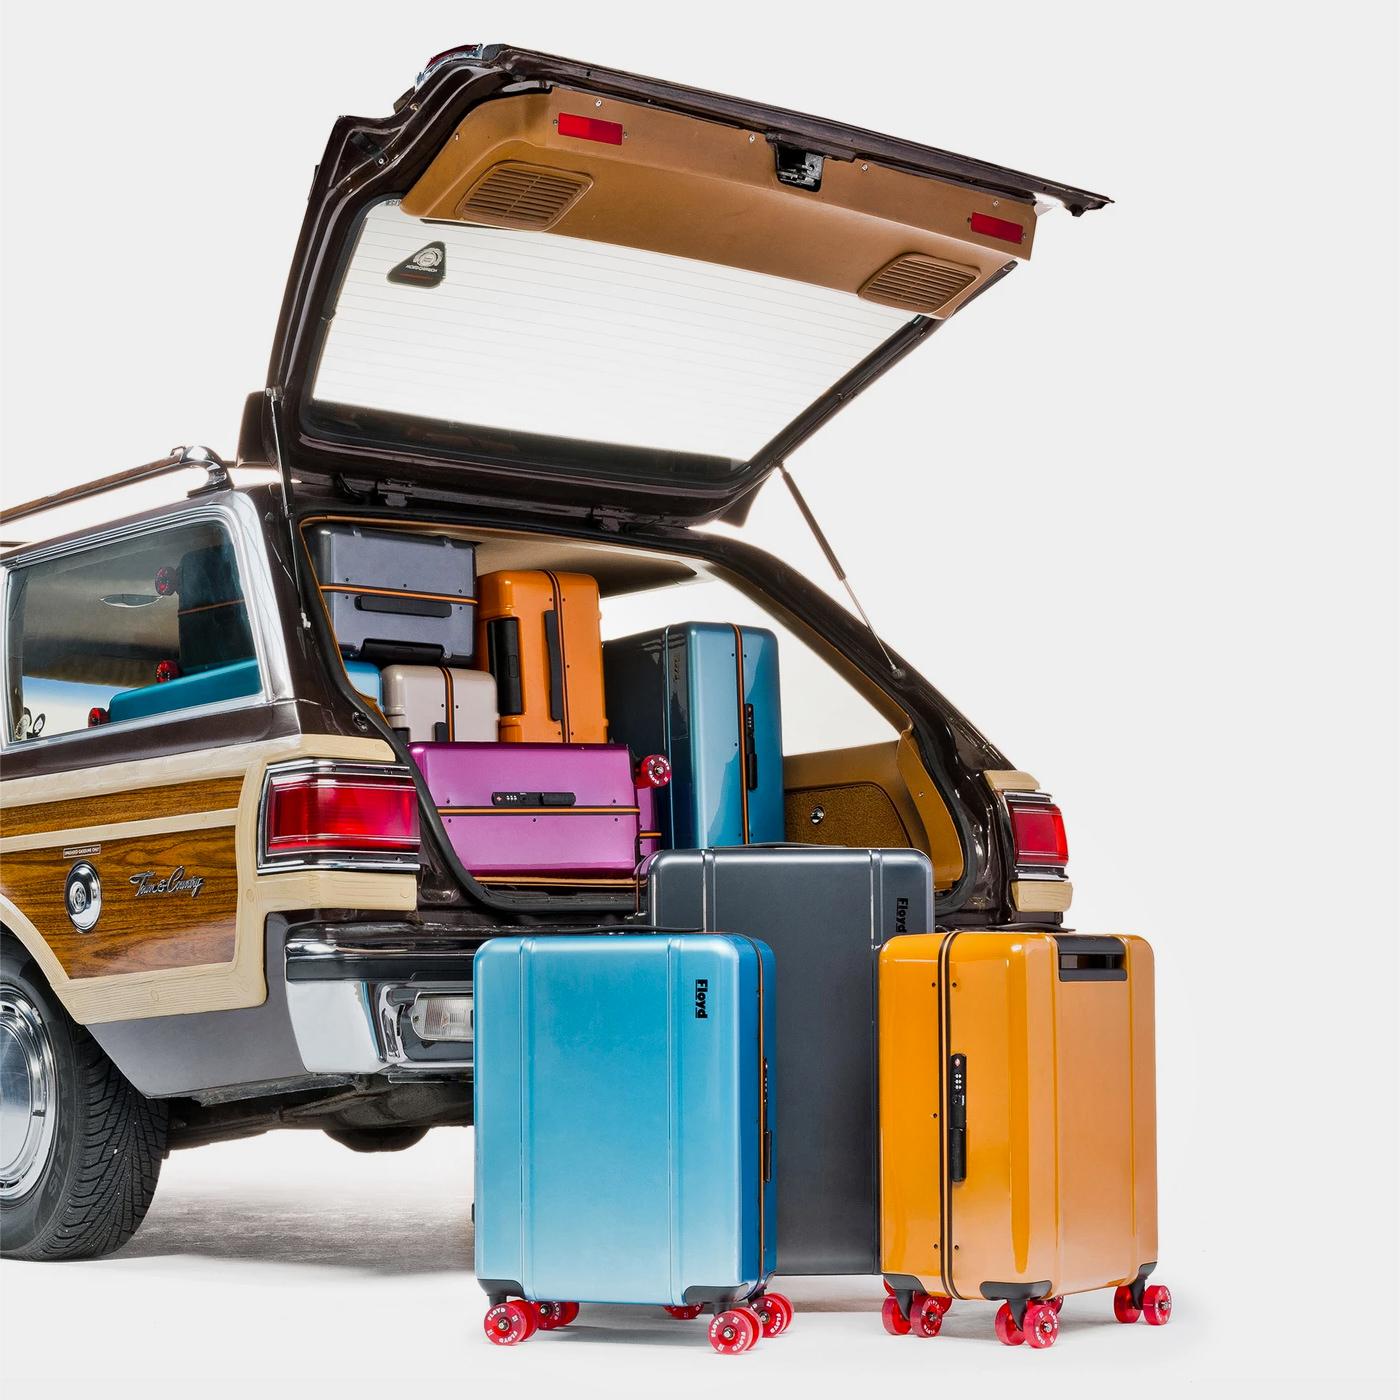 Floyd Valises Travel Case Cabin Check-In Inspiration Californie Venice Beach Skate Culture